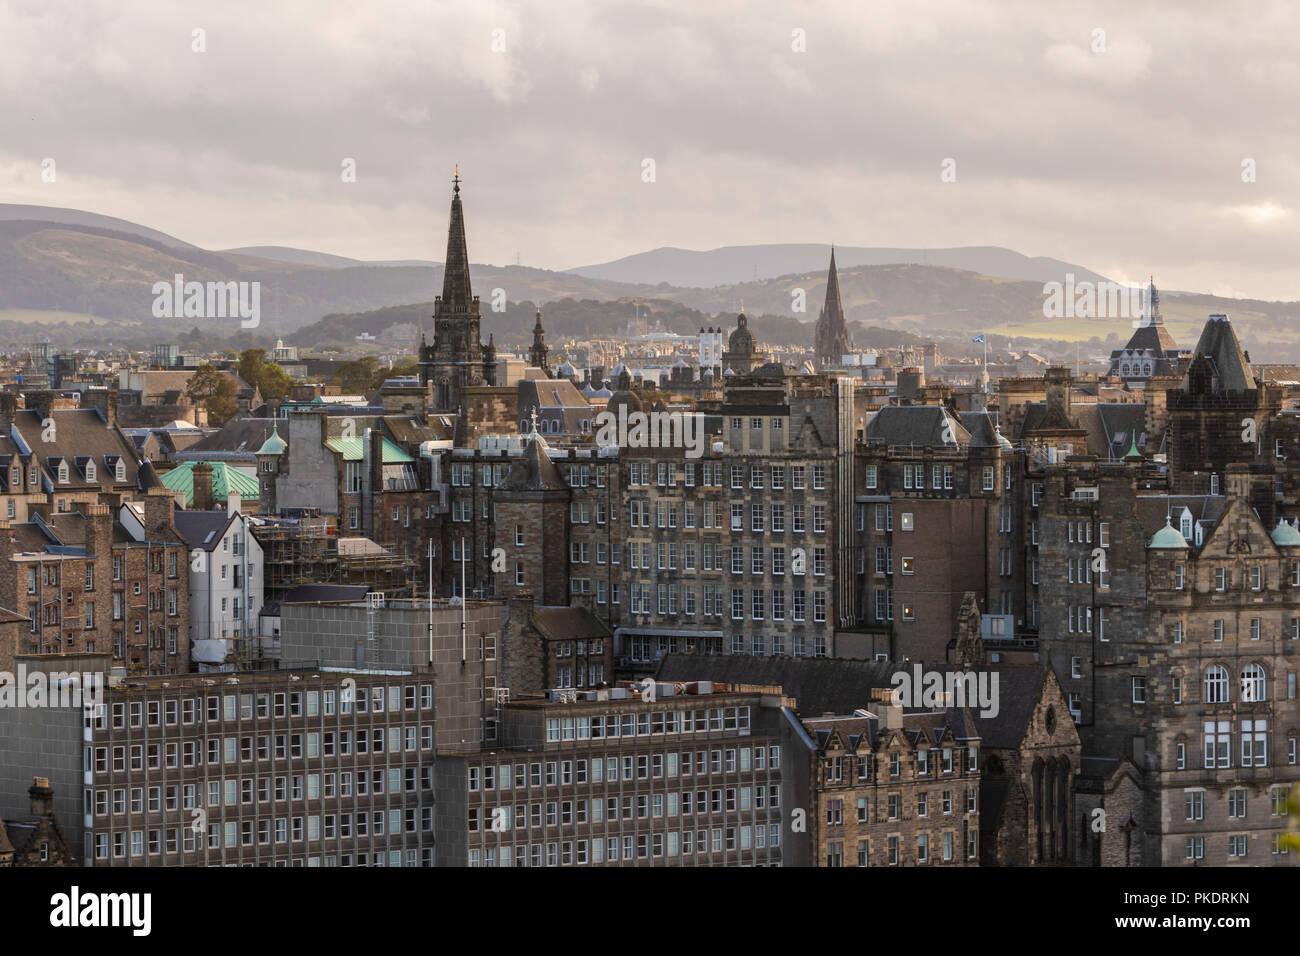 ea4c03a623b7 The Tron Kirk and Pentland Hills Edinburgh Skyline